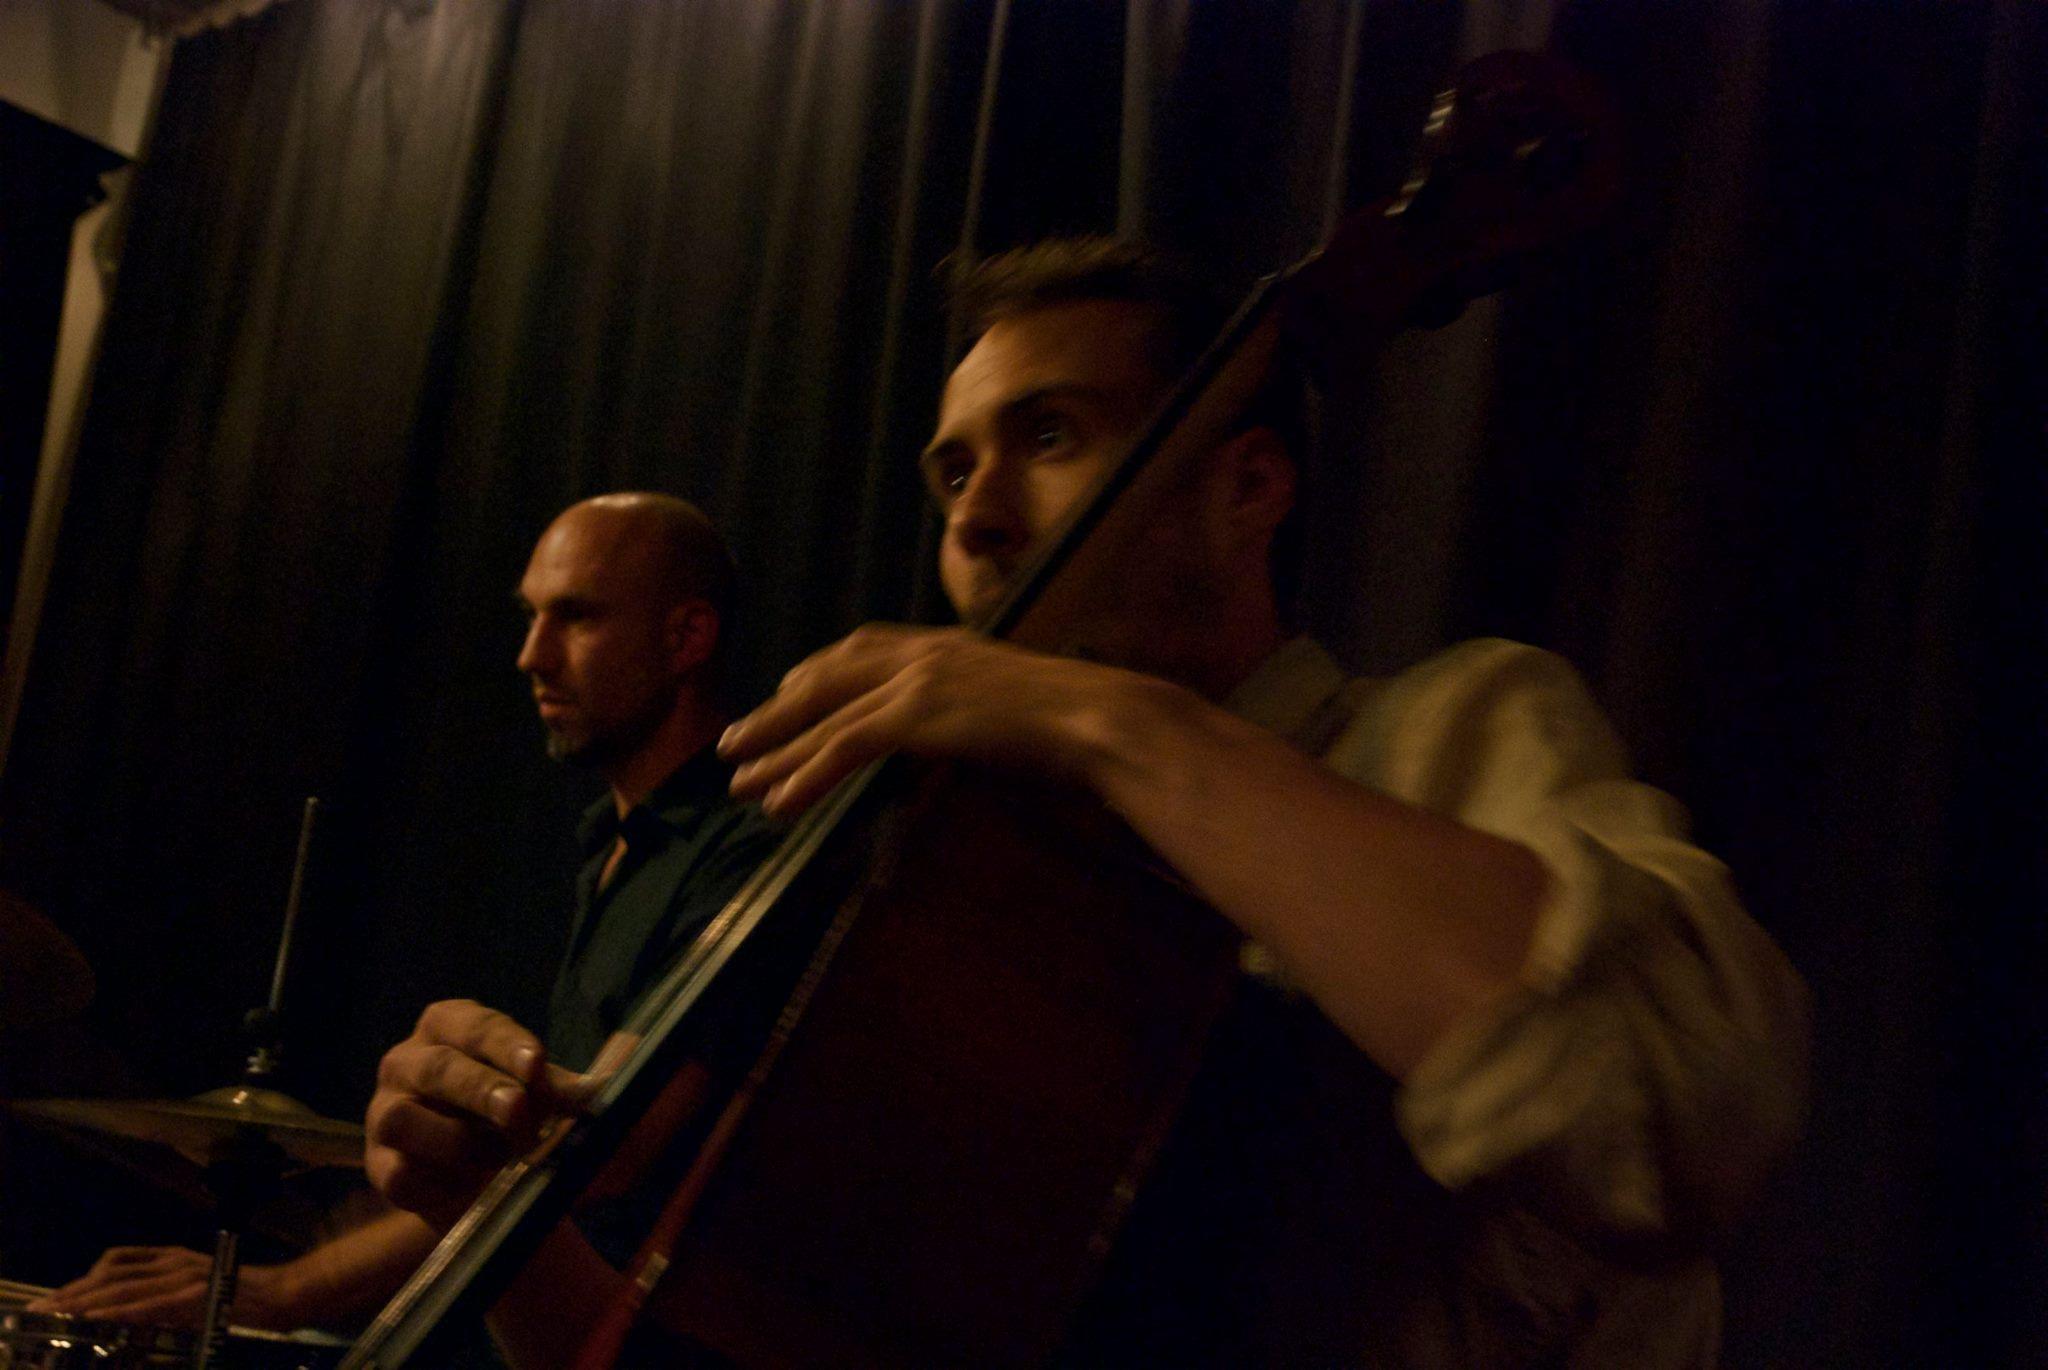 gábor hartyáni (cello and electronics) & robbert van hulzen (drums etc)